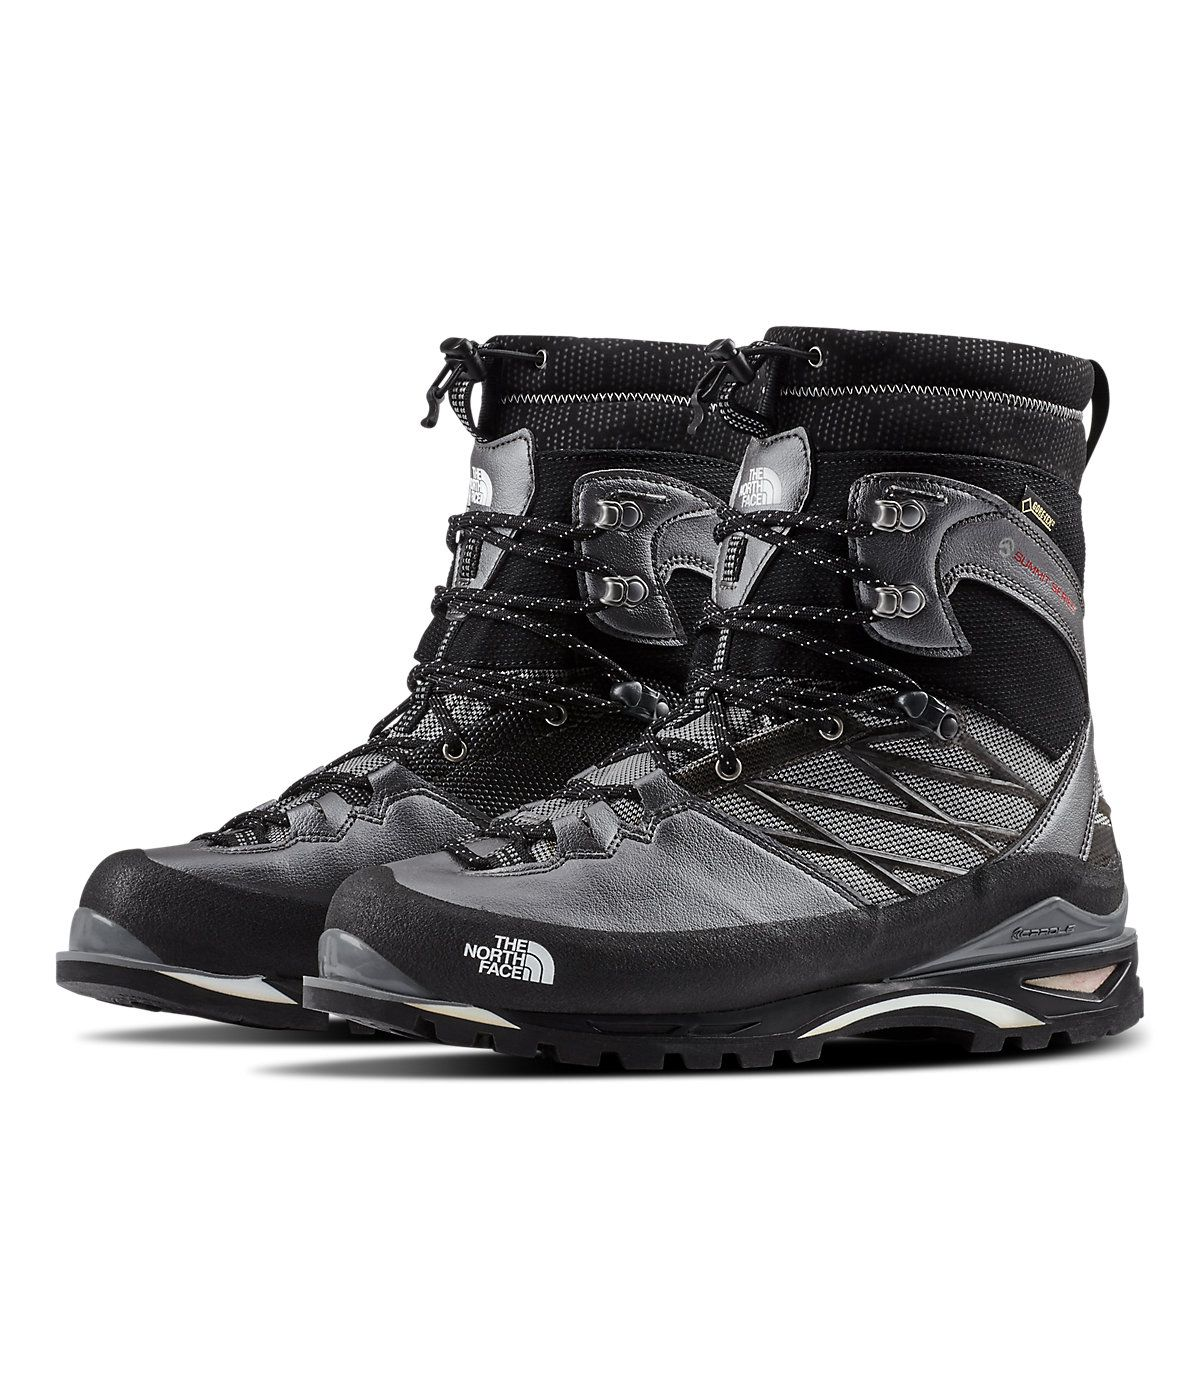 Men's verto s4k ice gtx   Mountaineering boots, Boots